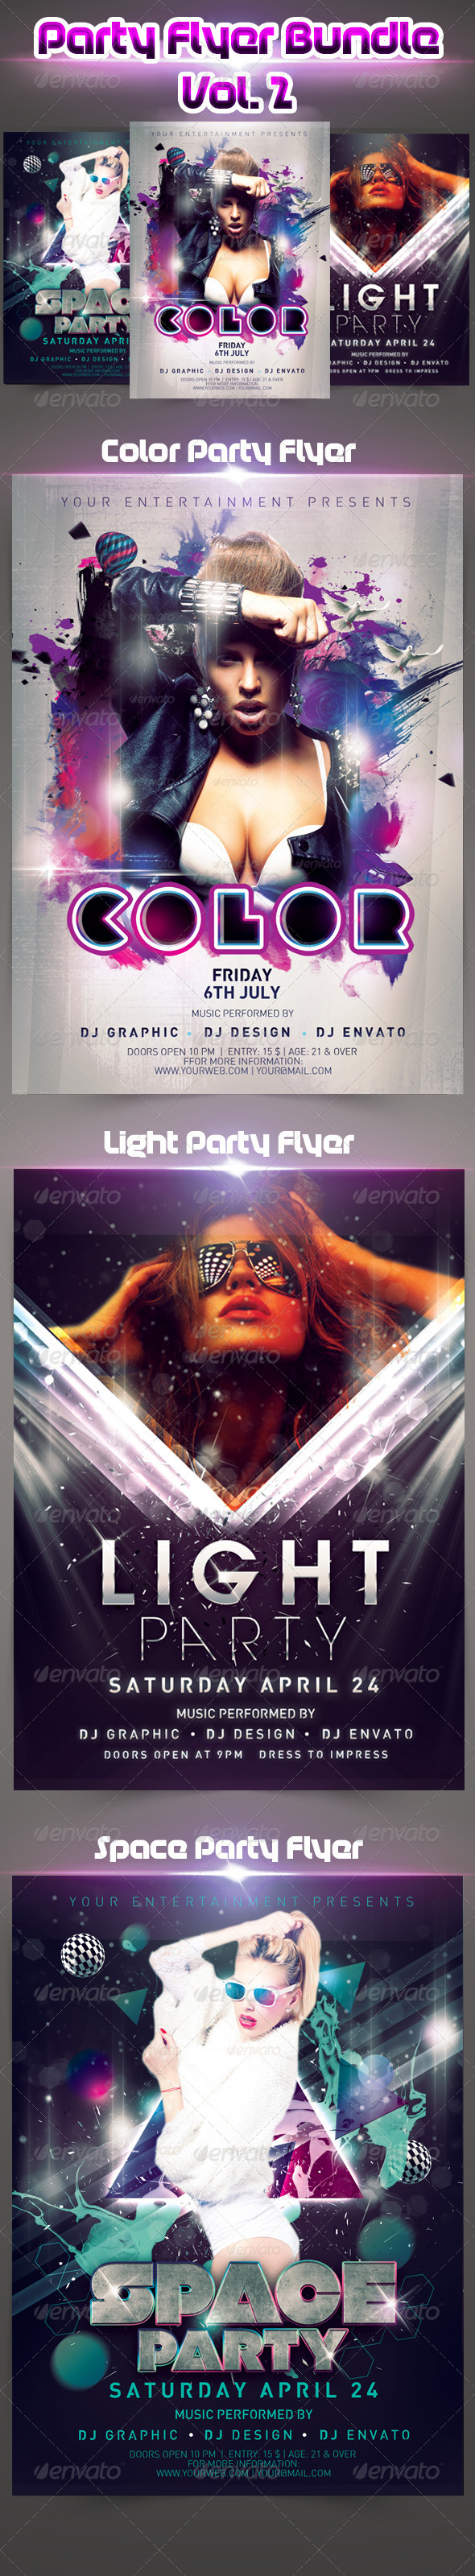 Party Flyer Bundle vol.2 - Events Flyers